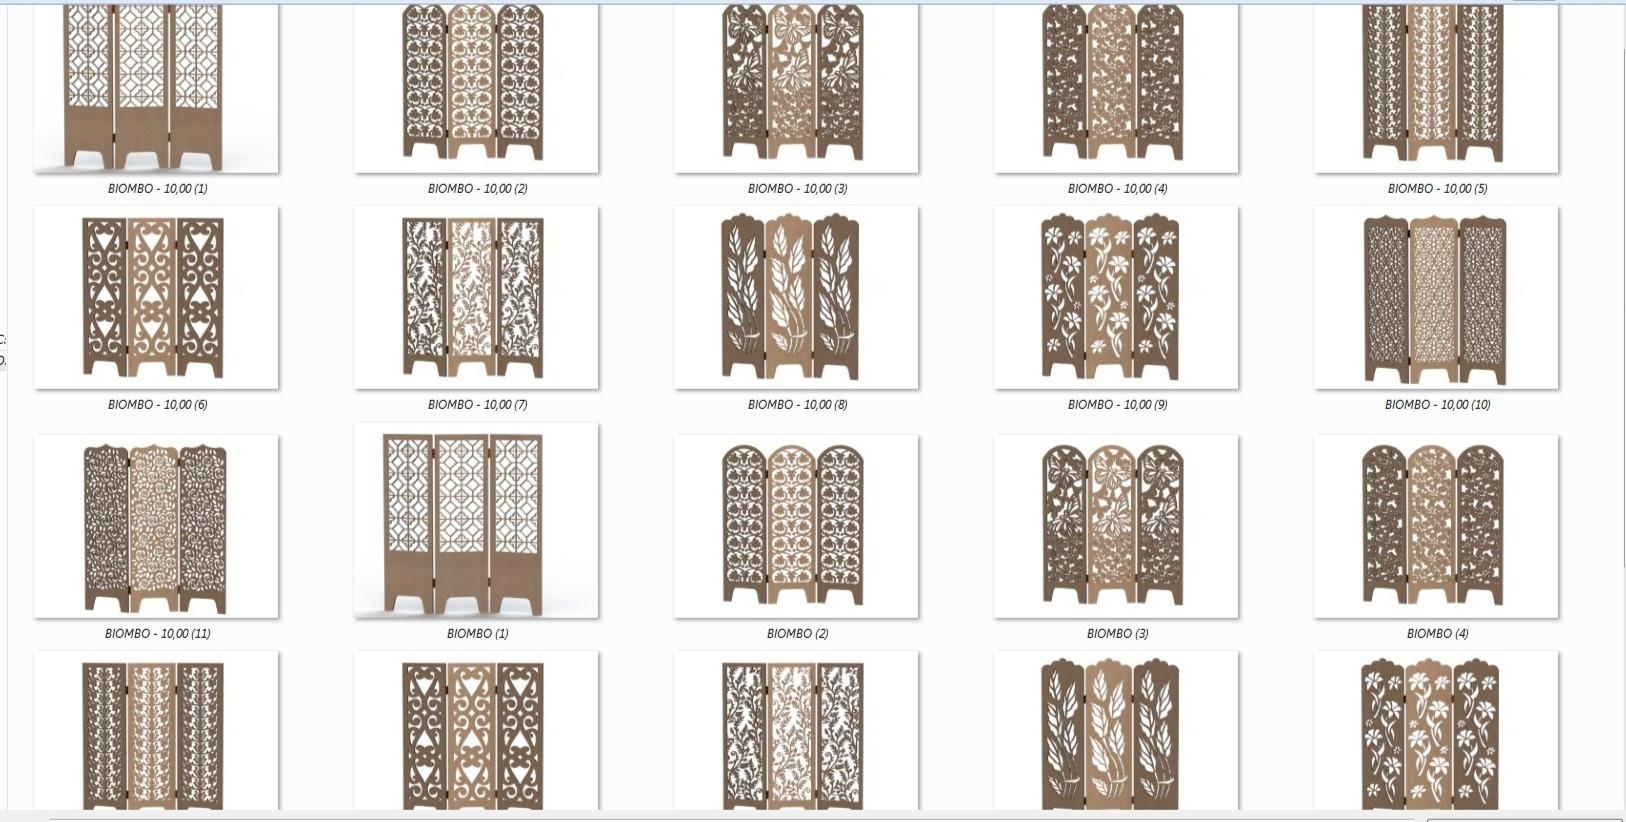 Decorative Panel Screens CDR File